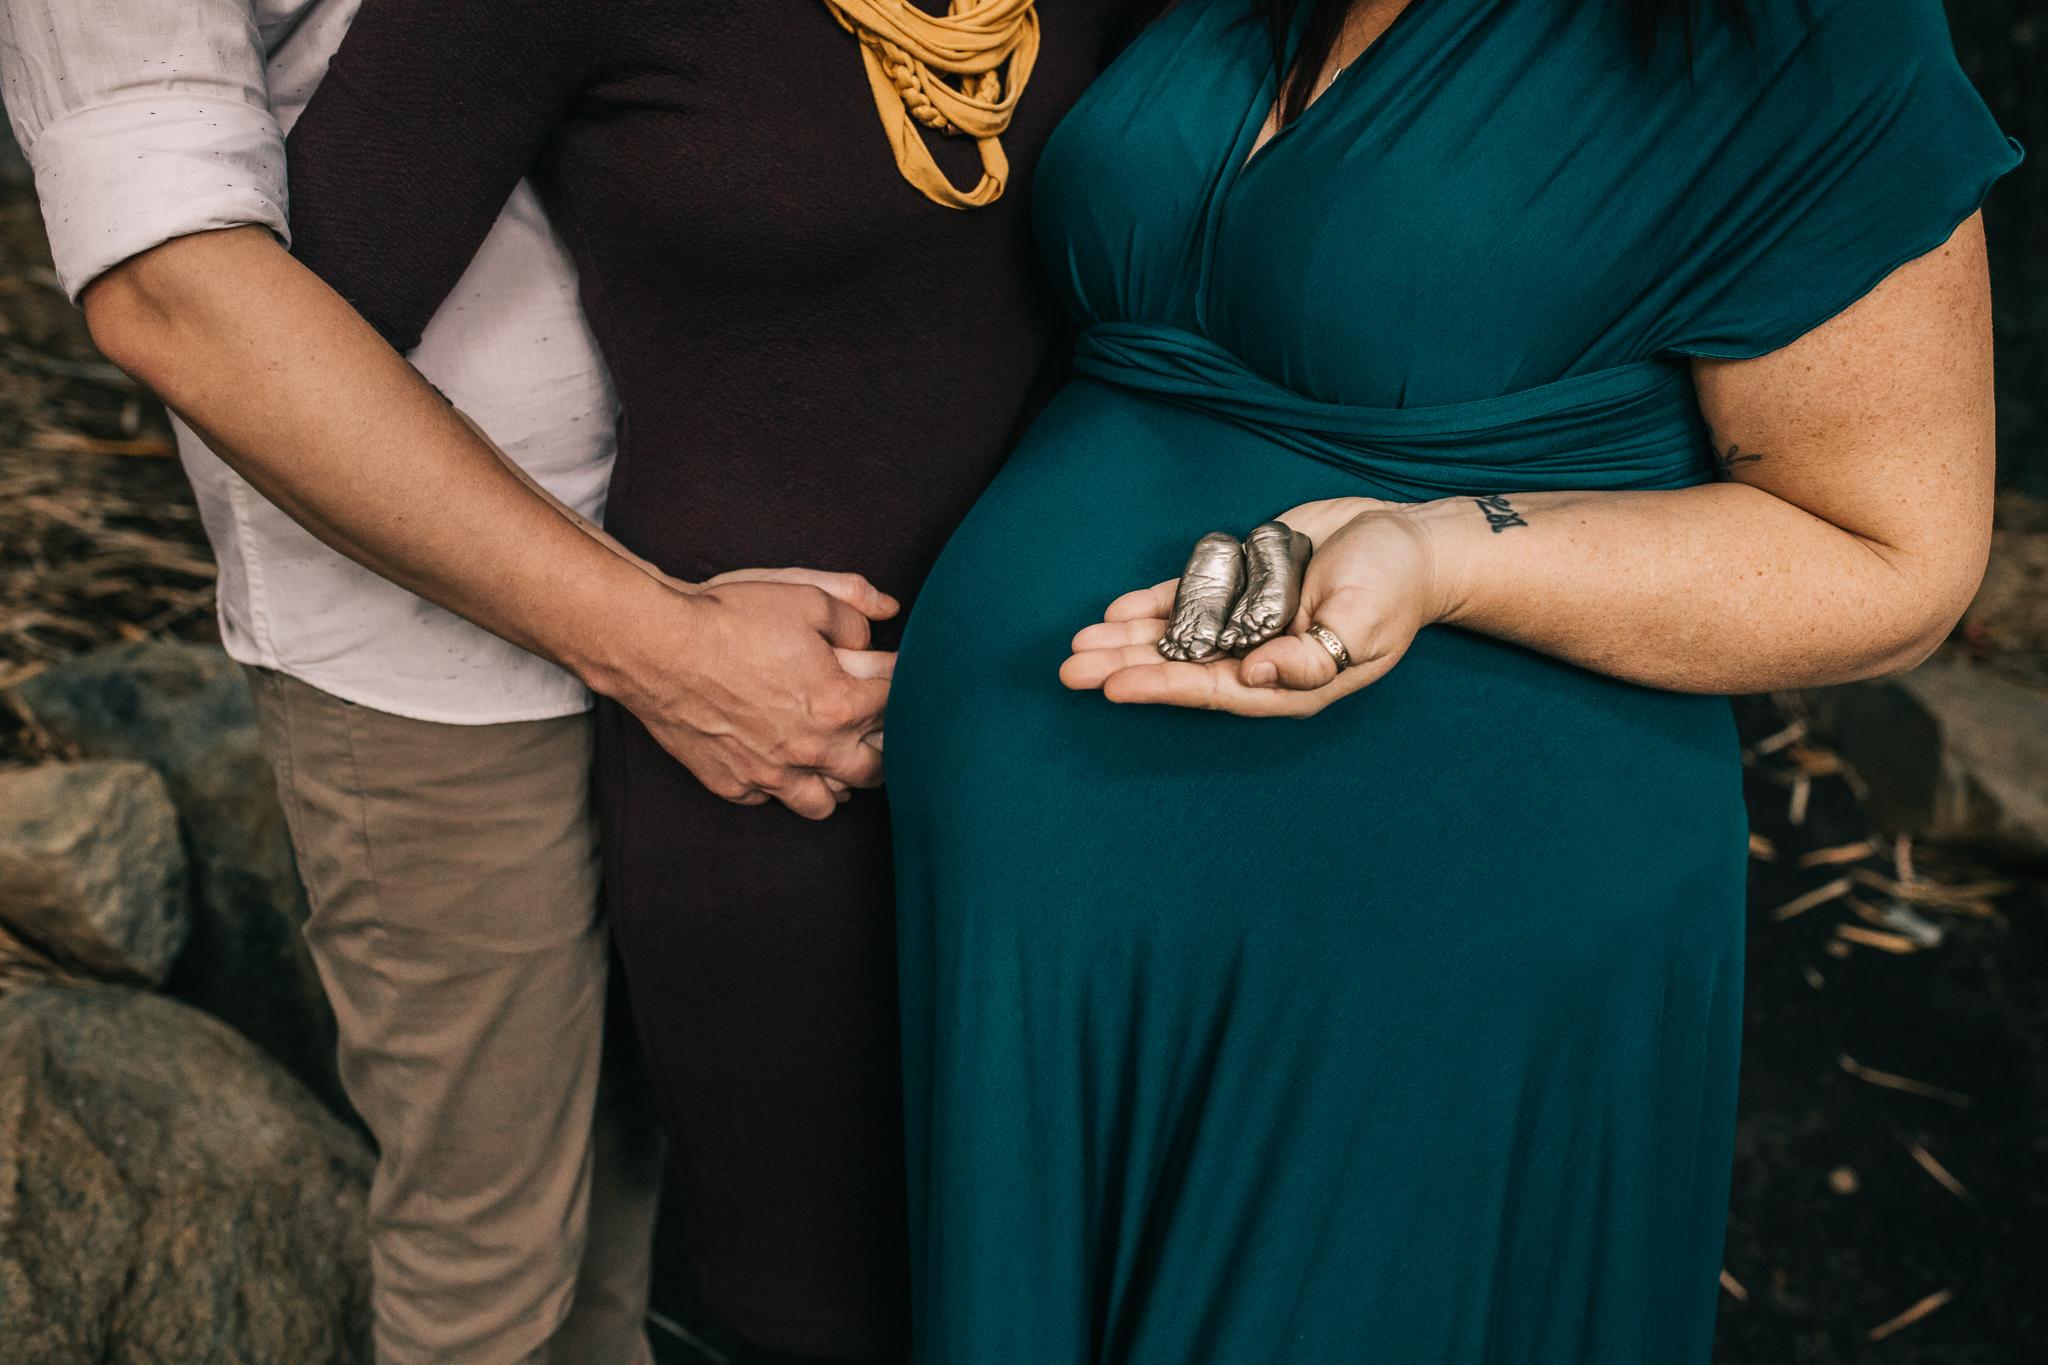 Brisbane surrogate